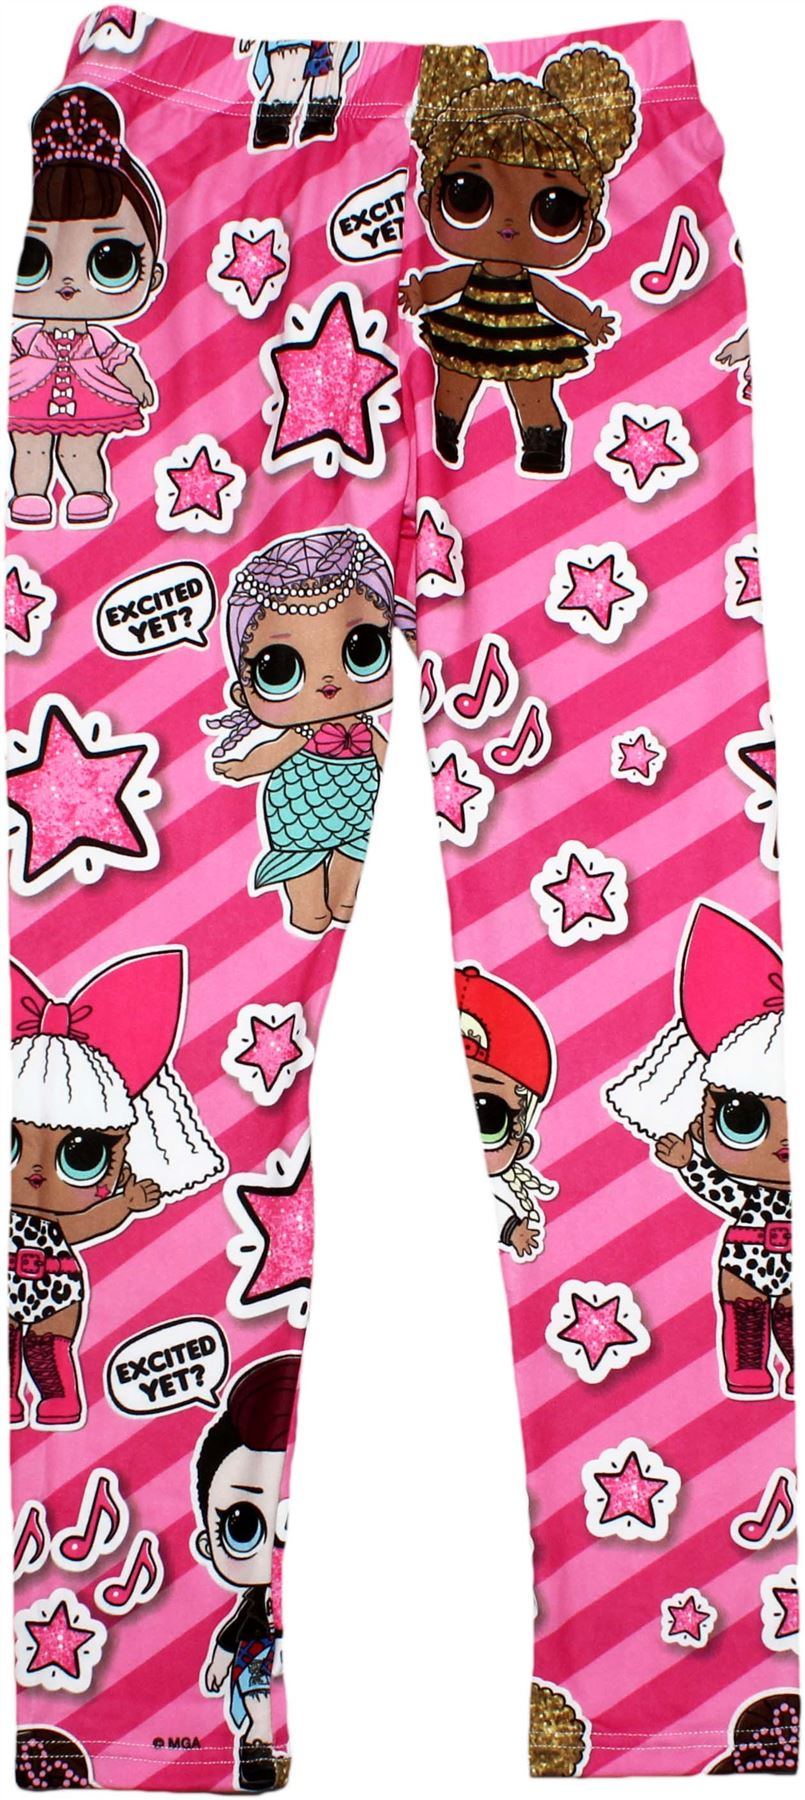 Lol Surprise Doll Girls Kids Leggings Pants Ebay